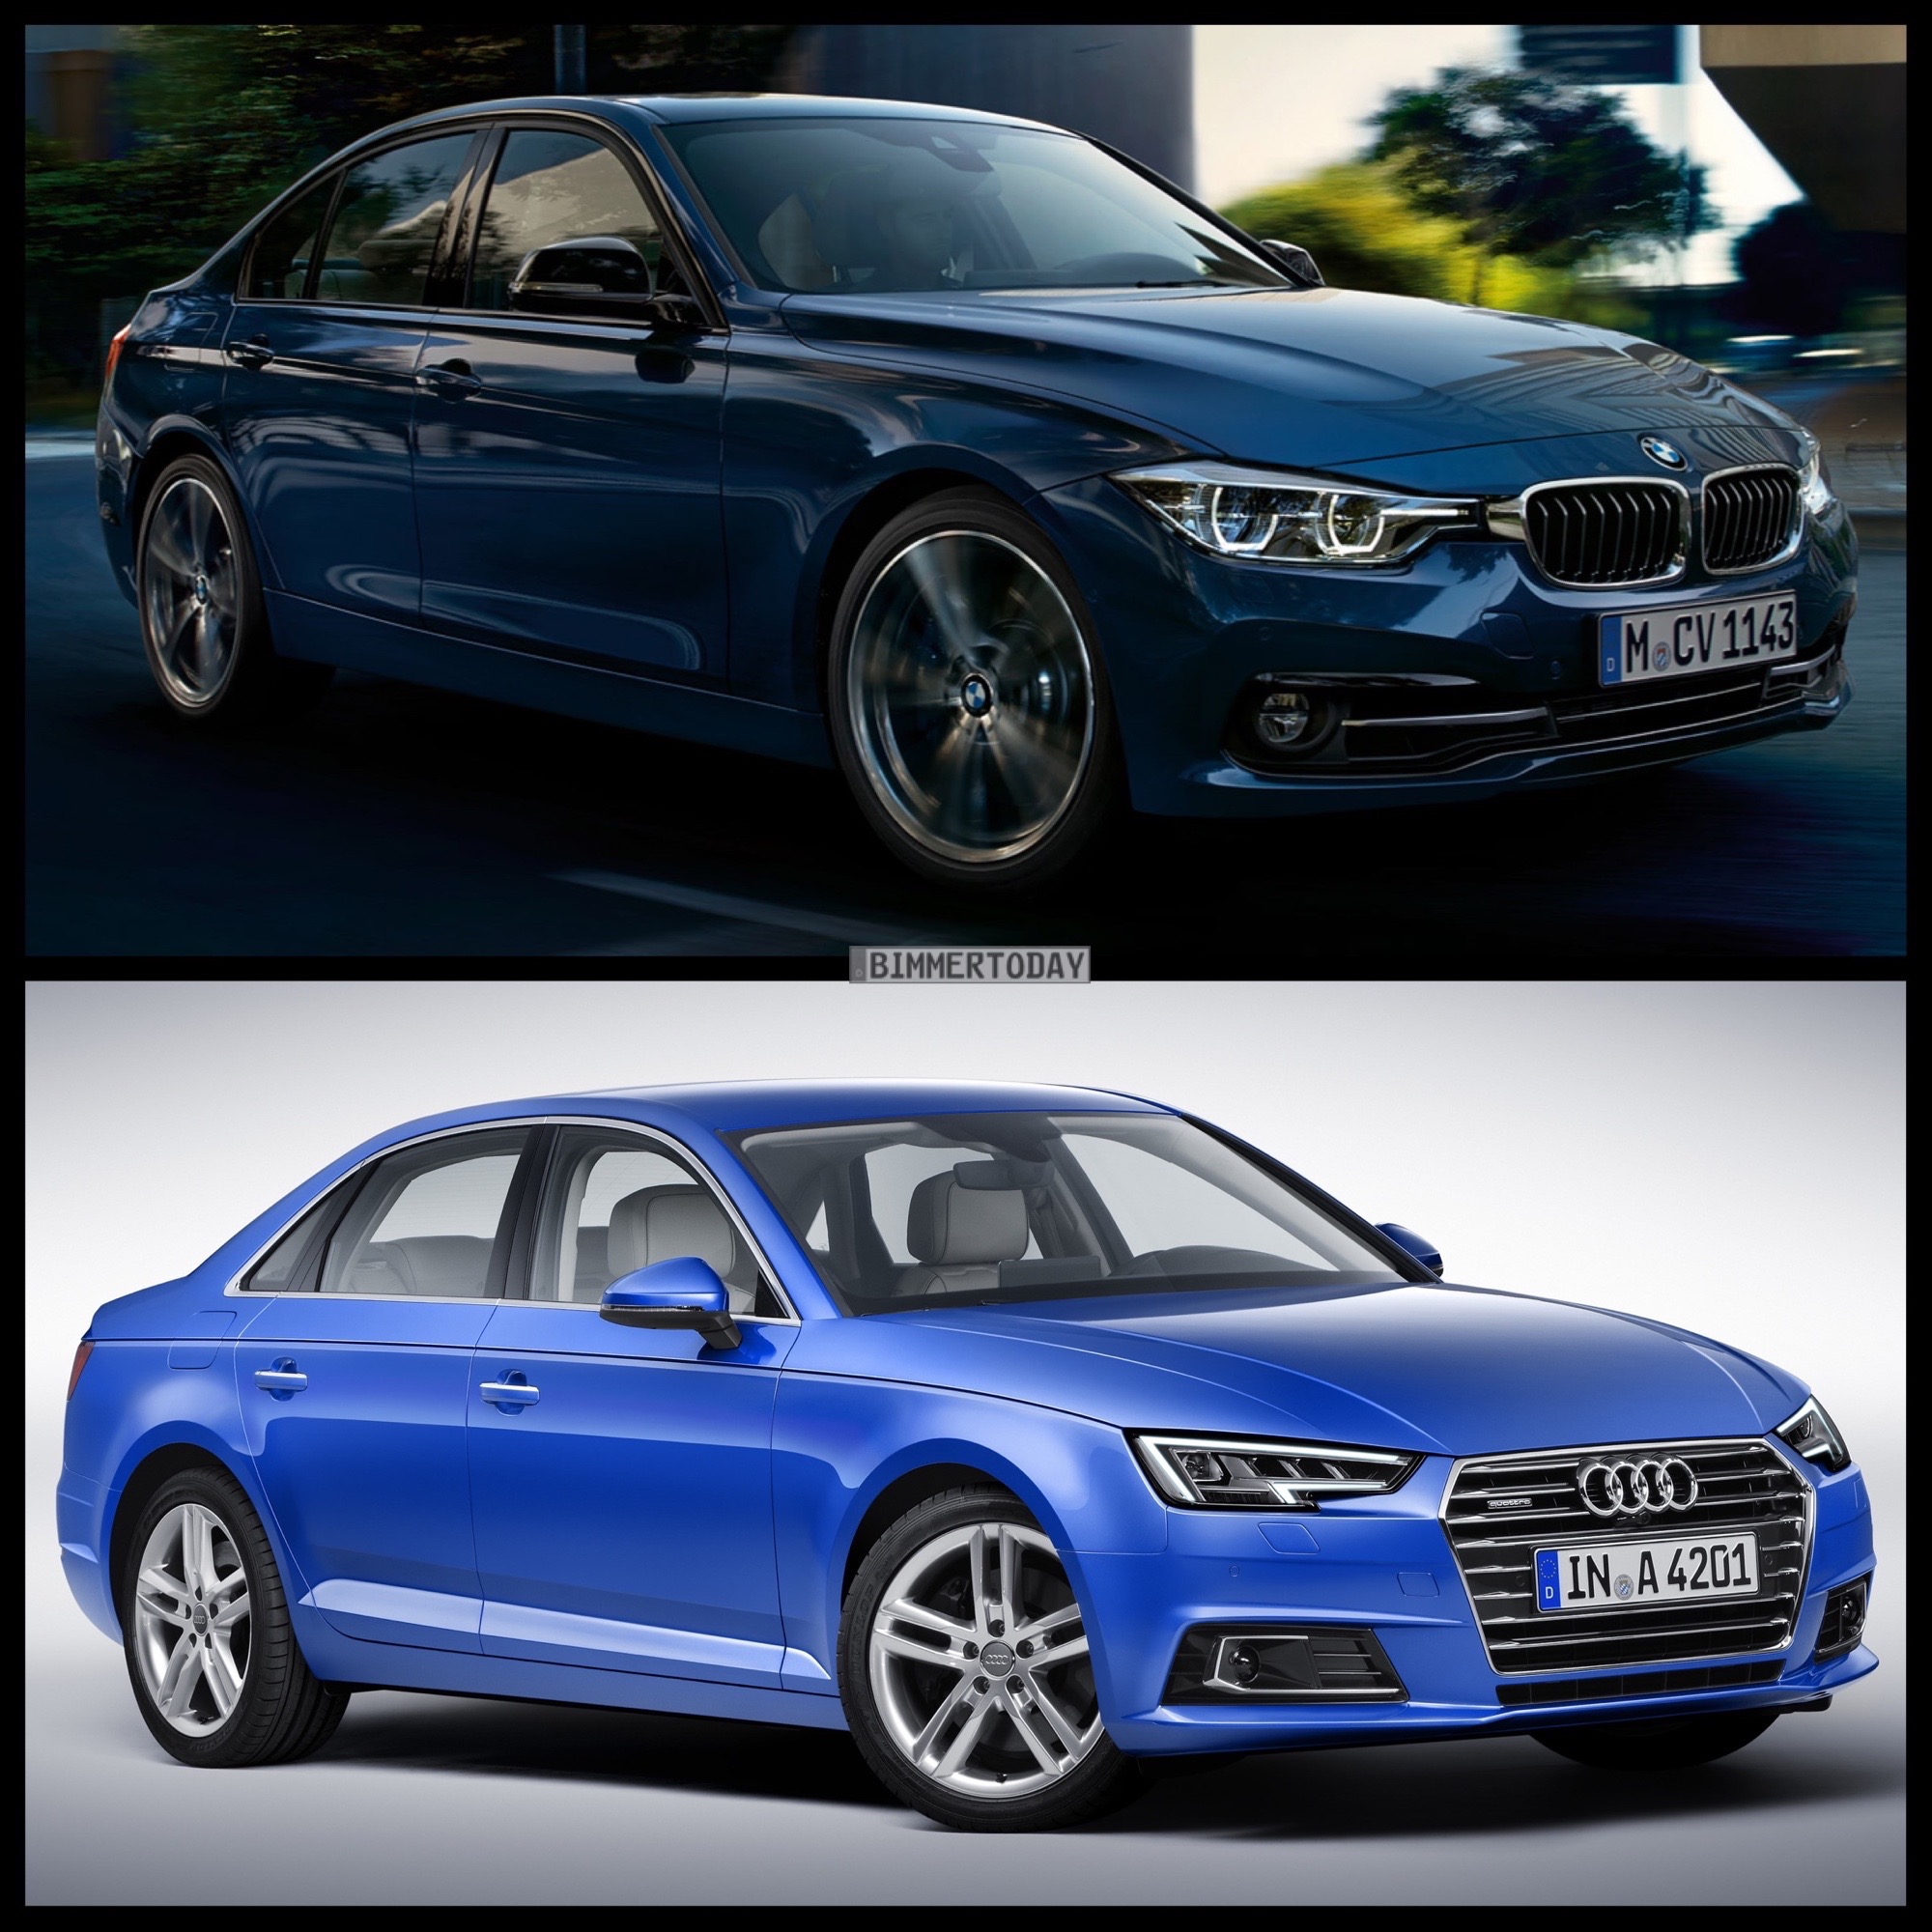 Photo Comparison: 2016 BMW 3 Series Vs. 2017 Audi A4